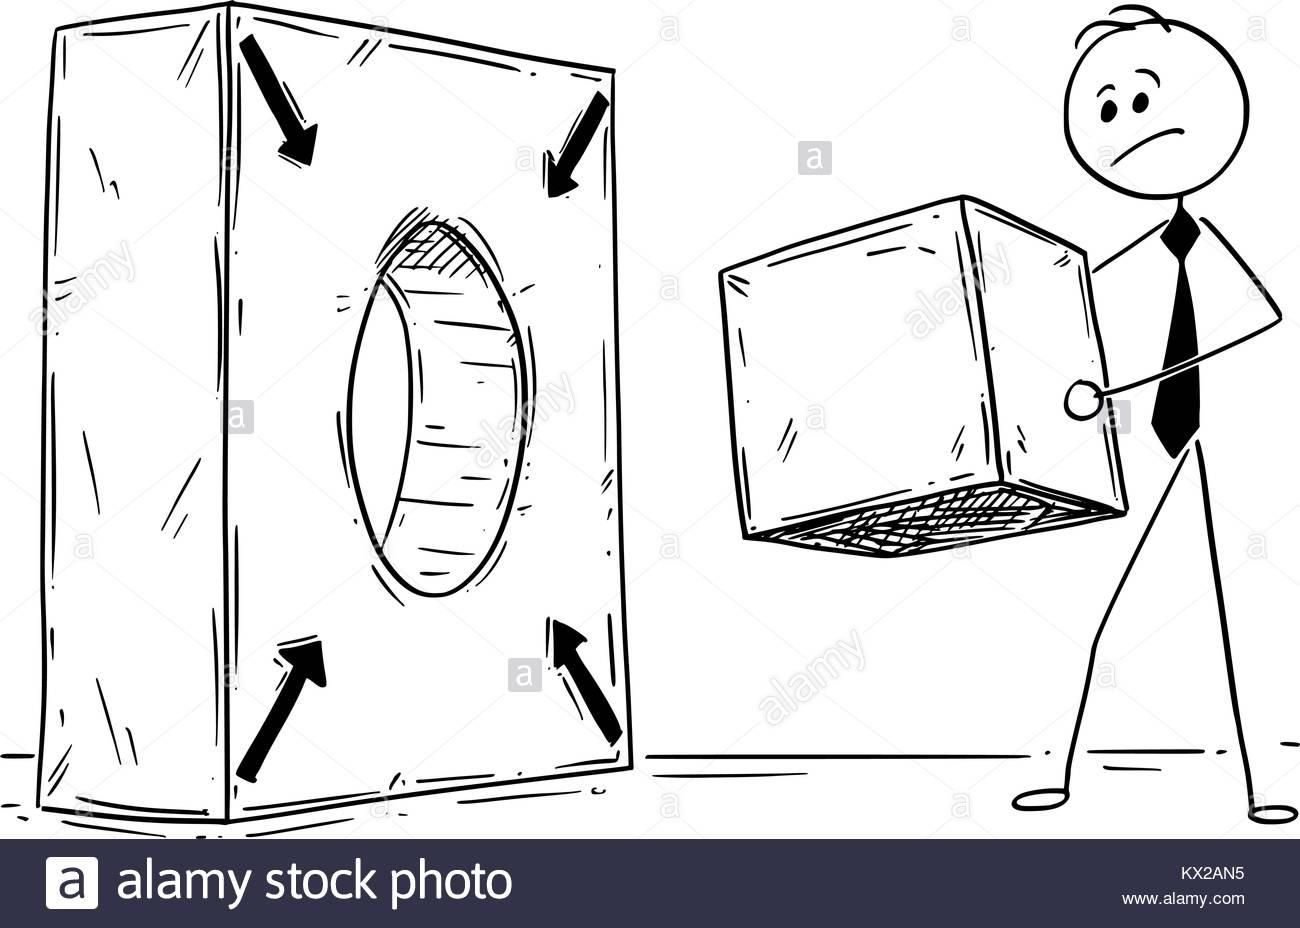 1300x928 Cartoon Stick Man Drawing Conceptual Illustration Of Businessman